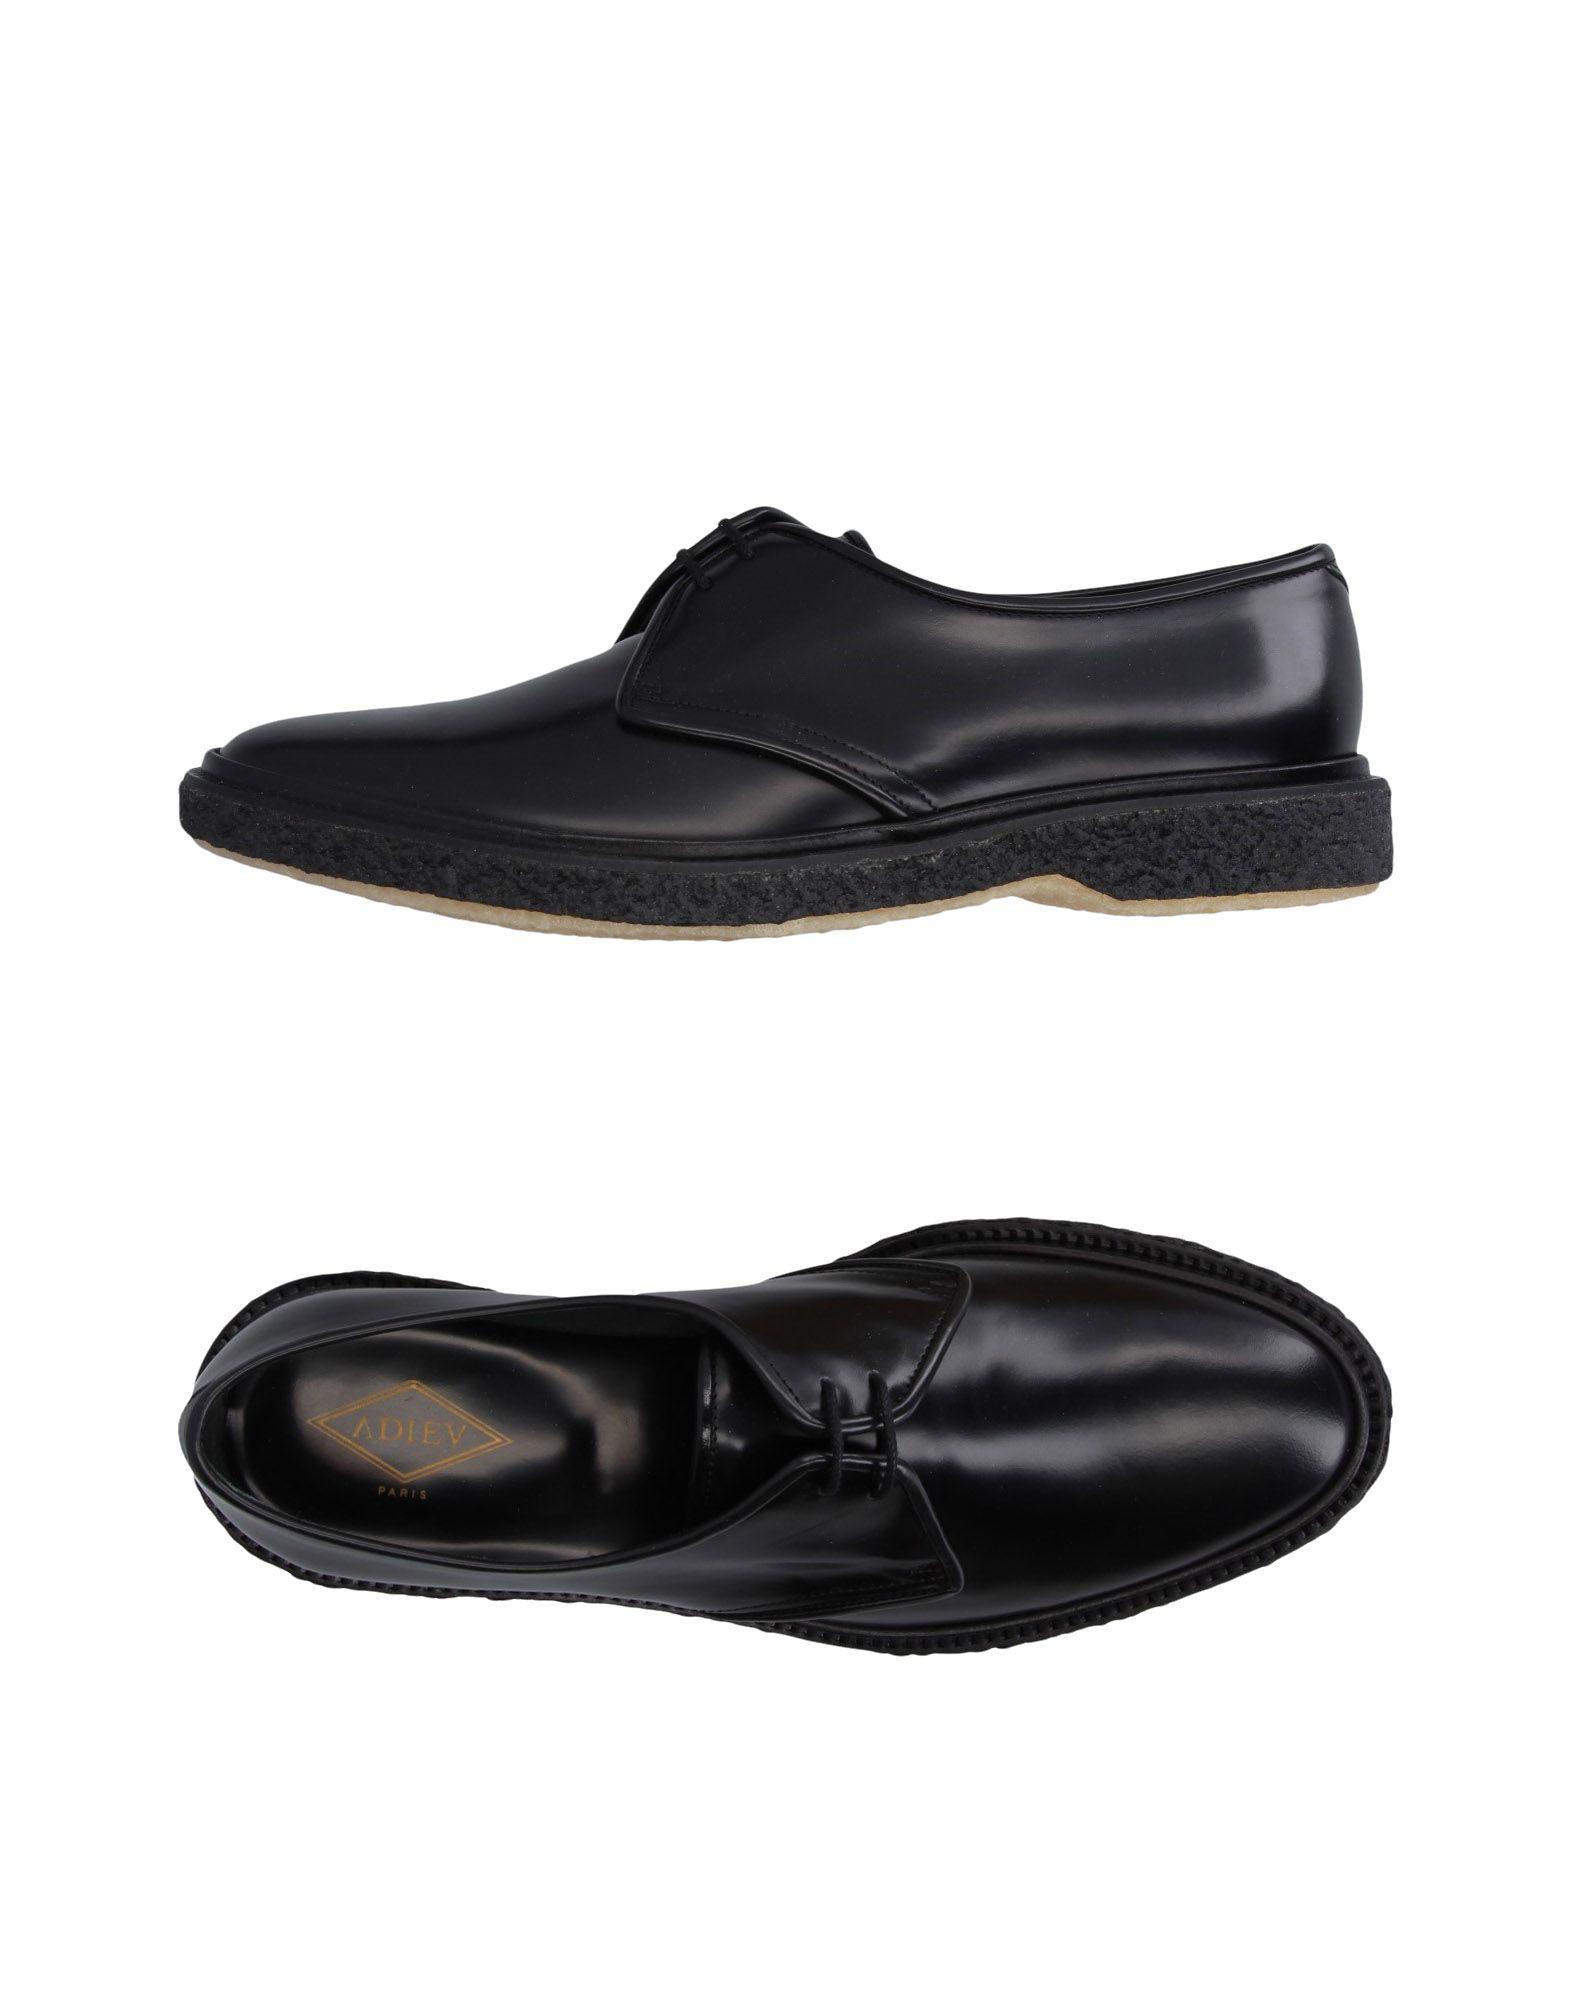 Haltbare Mode billige Schuhe Adieu Schnürschuhe Herren  11217313BP Heiße Schuhe